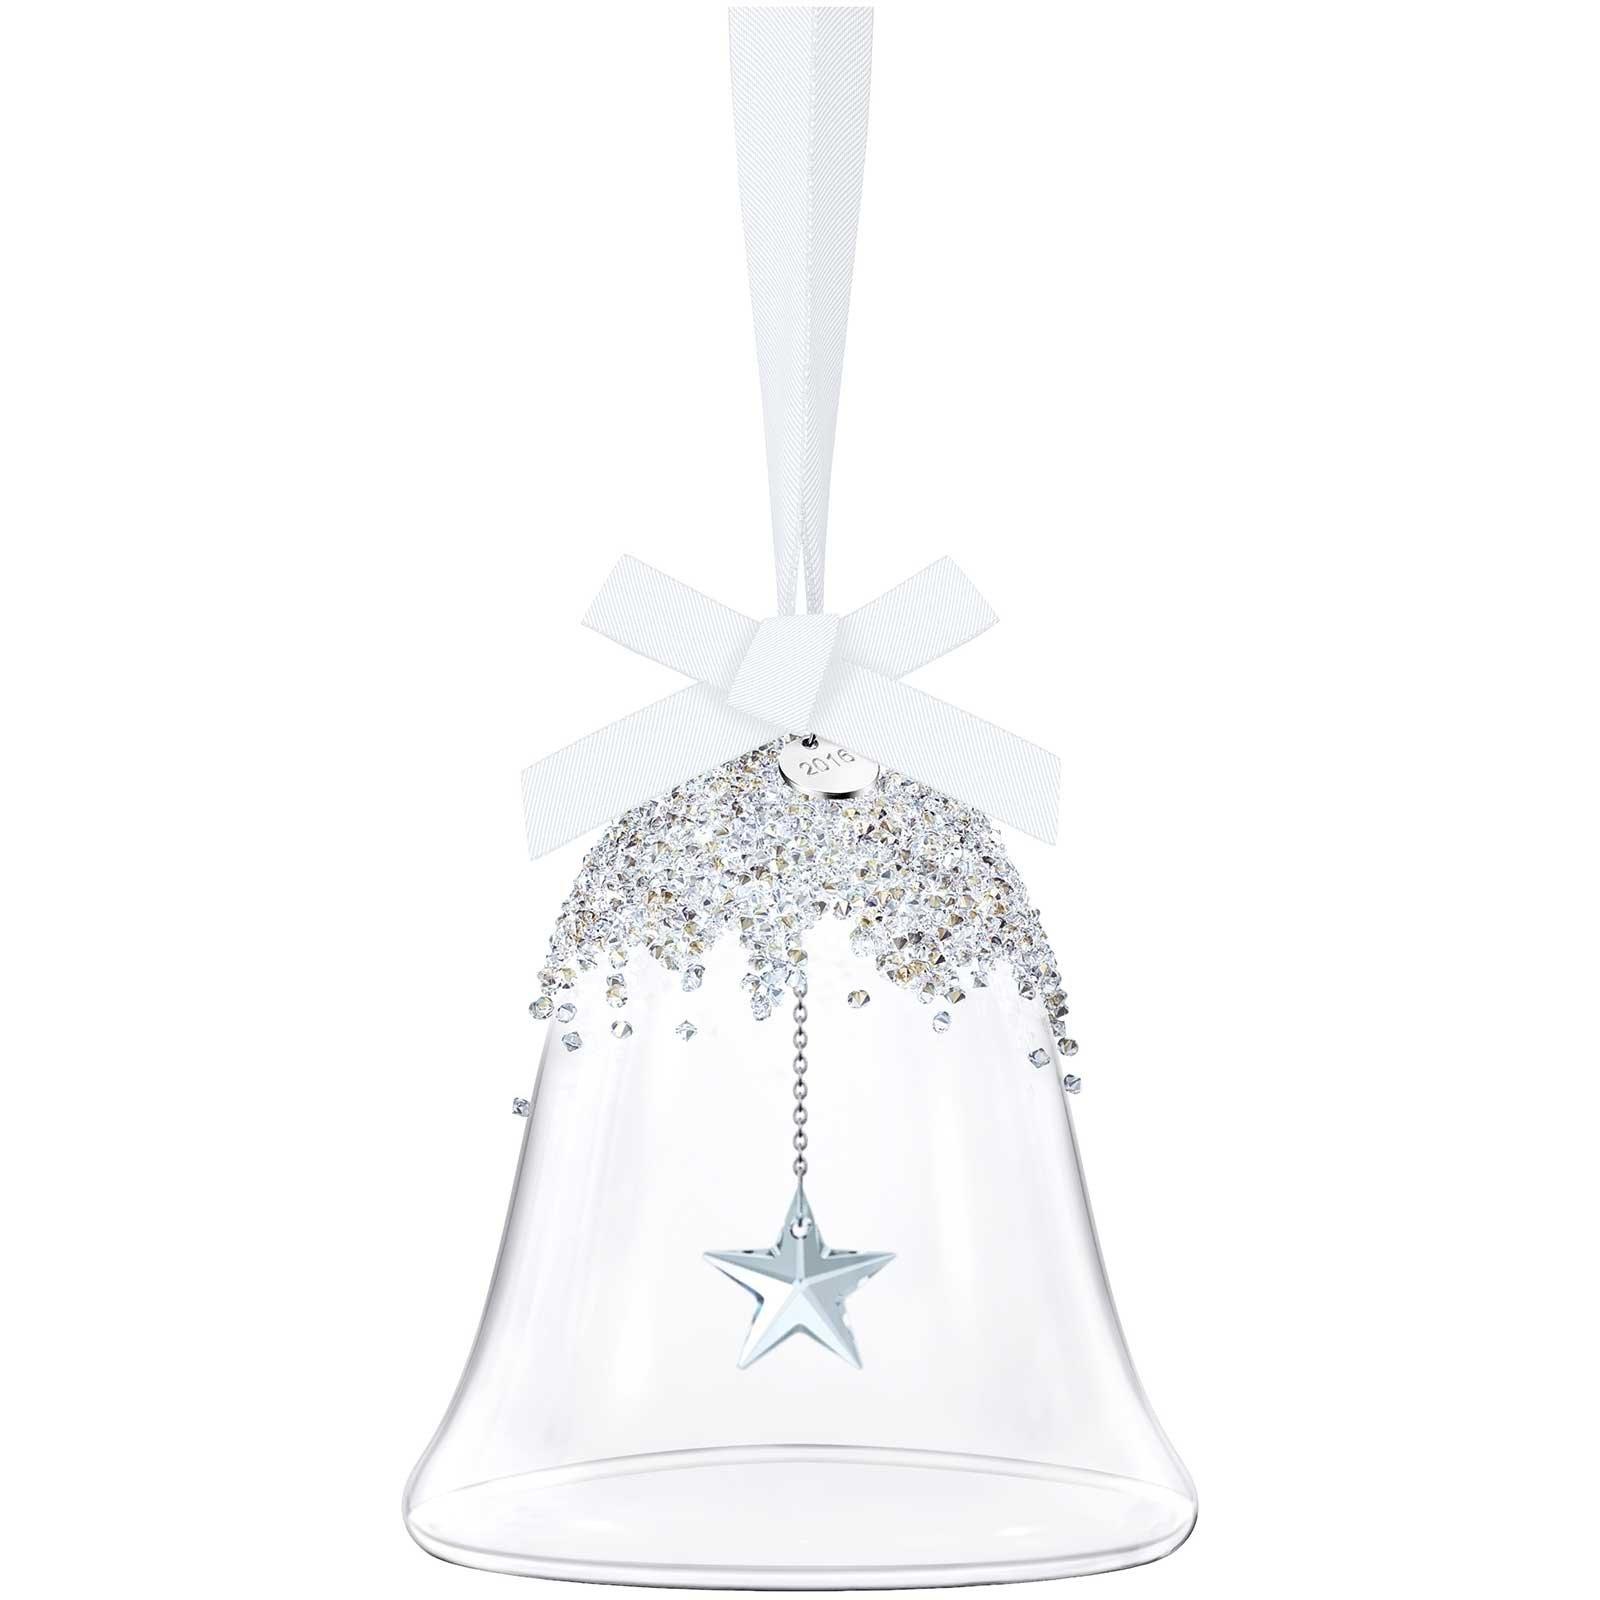 Swarovski Annual Edition 2016 Christmas Bell Ornament